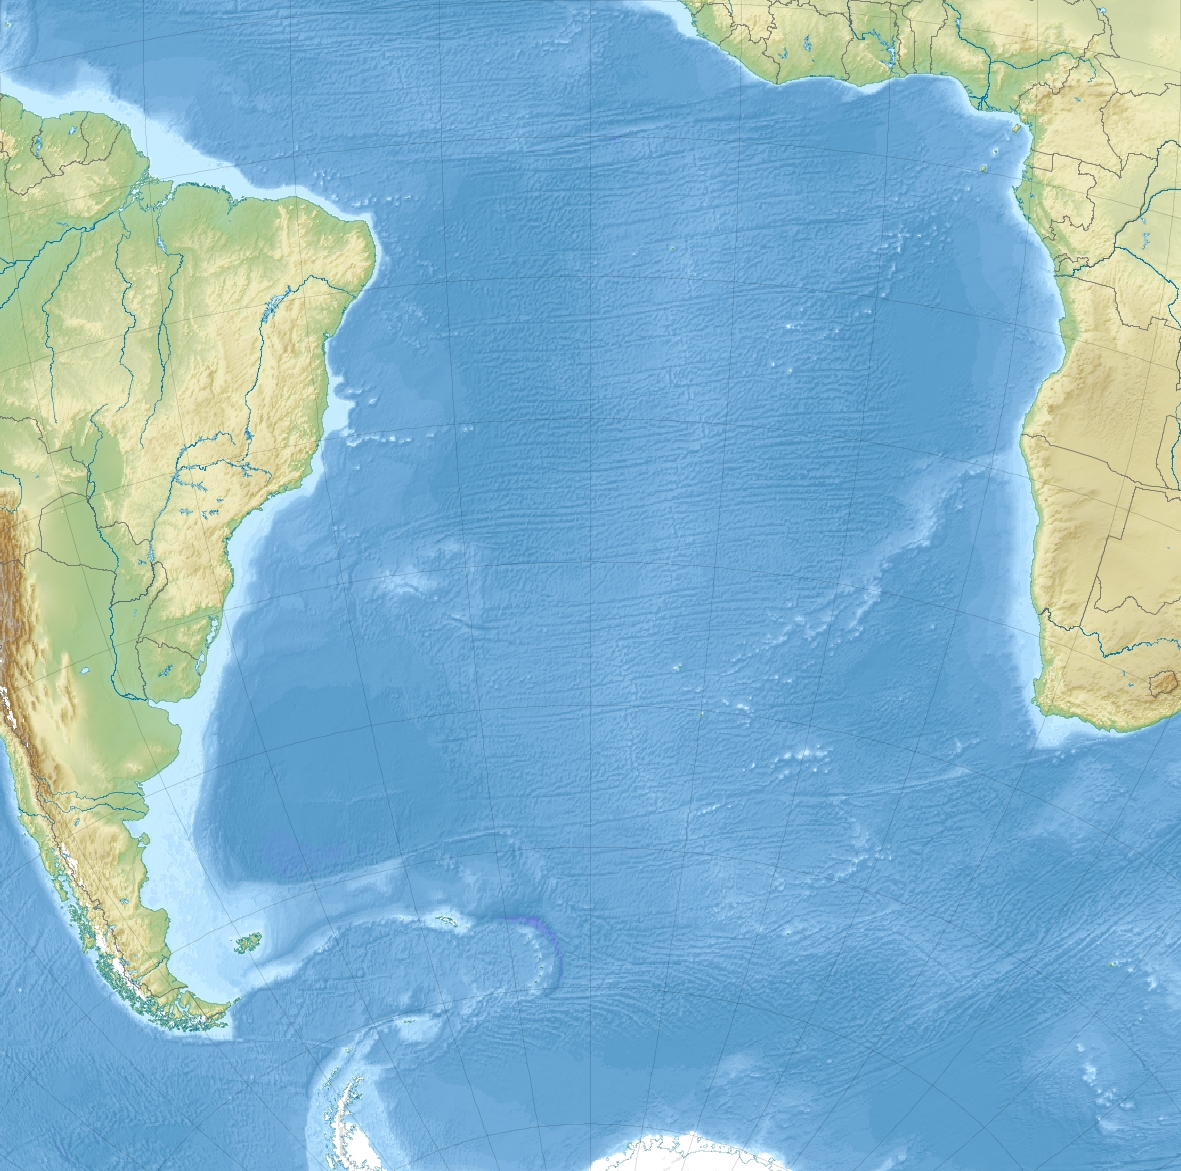 FileSouth Atlantic Ocean laea relief location mapjpg  Wikimedia